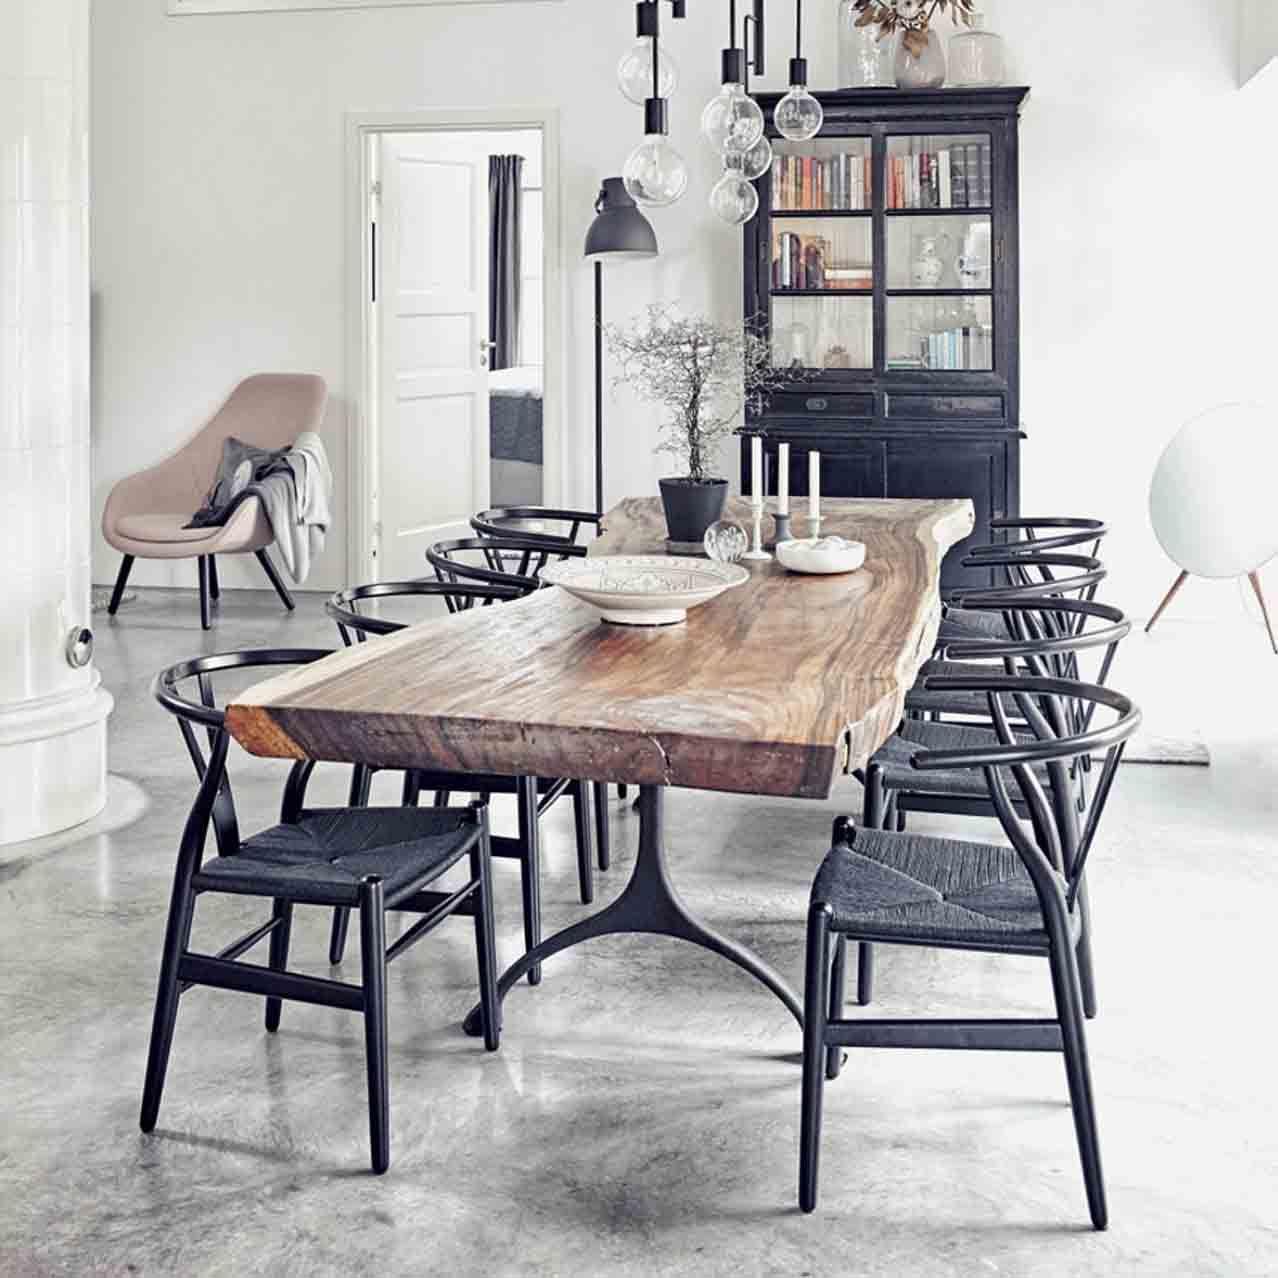 Ch24 wishbone chair black edition in 2020 black dining